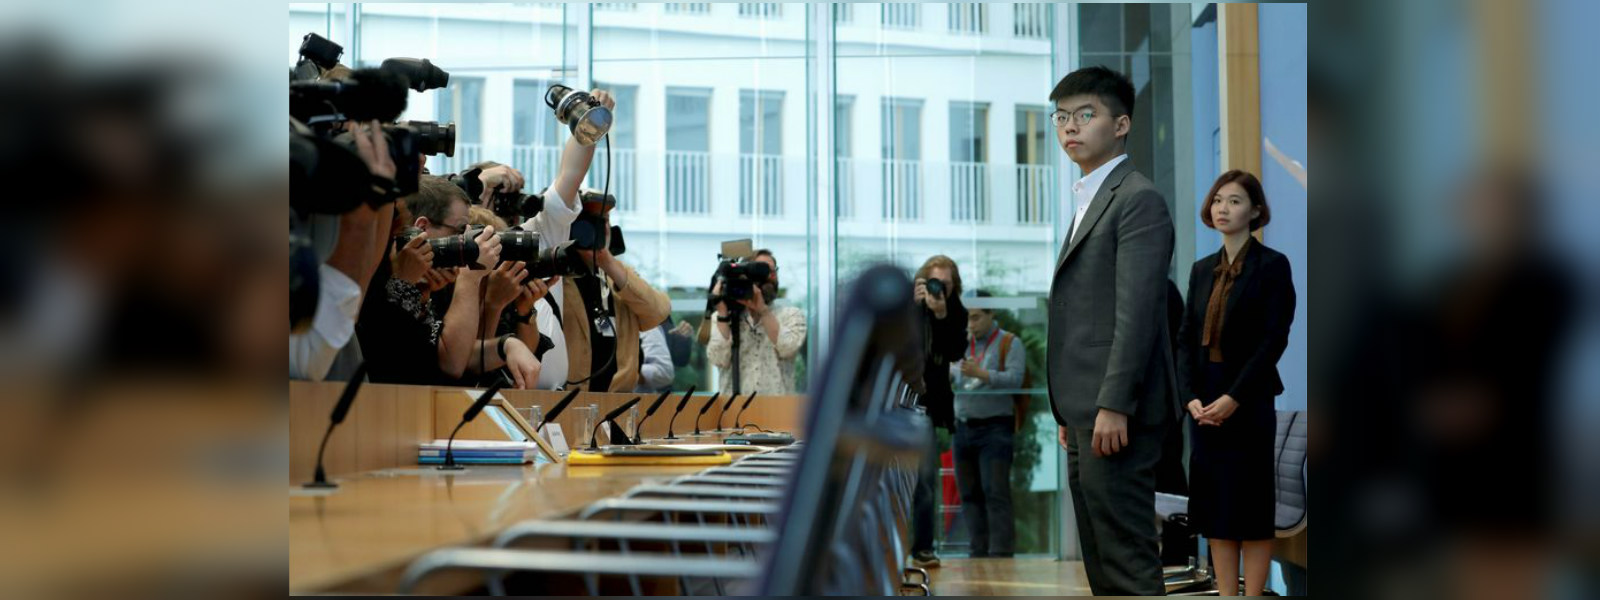 Hong Kong activist Wong on US visit to put 'global spotlight' on protest movement